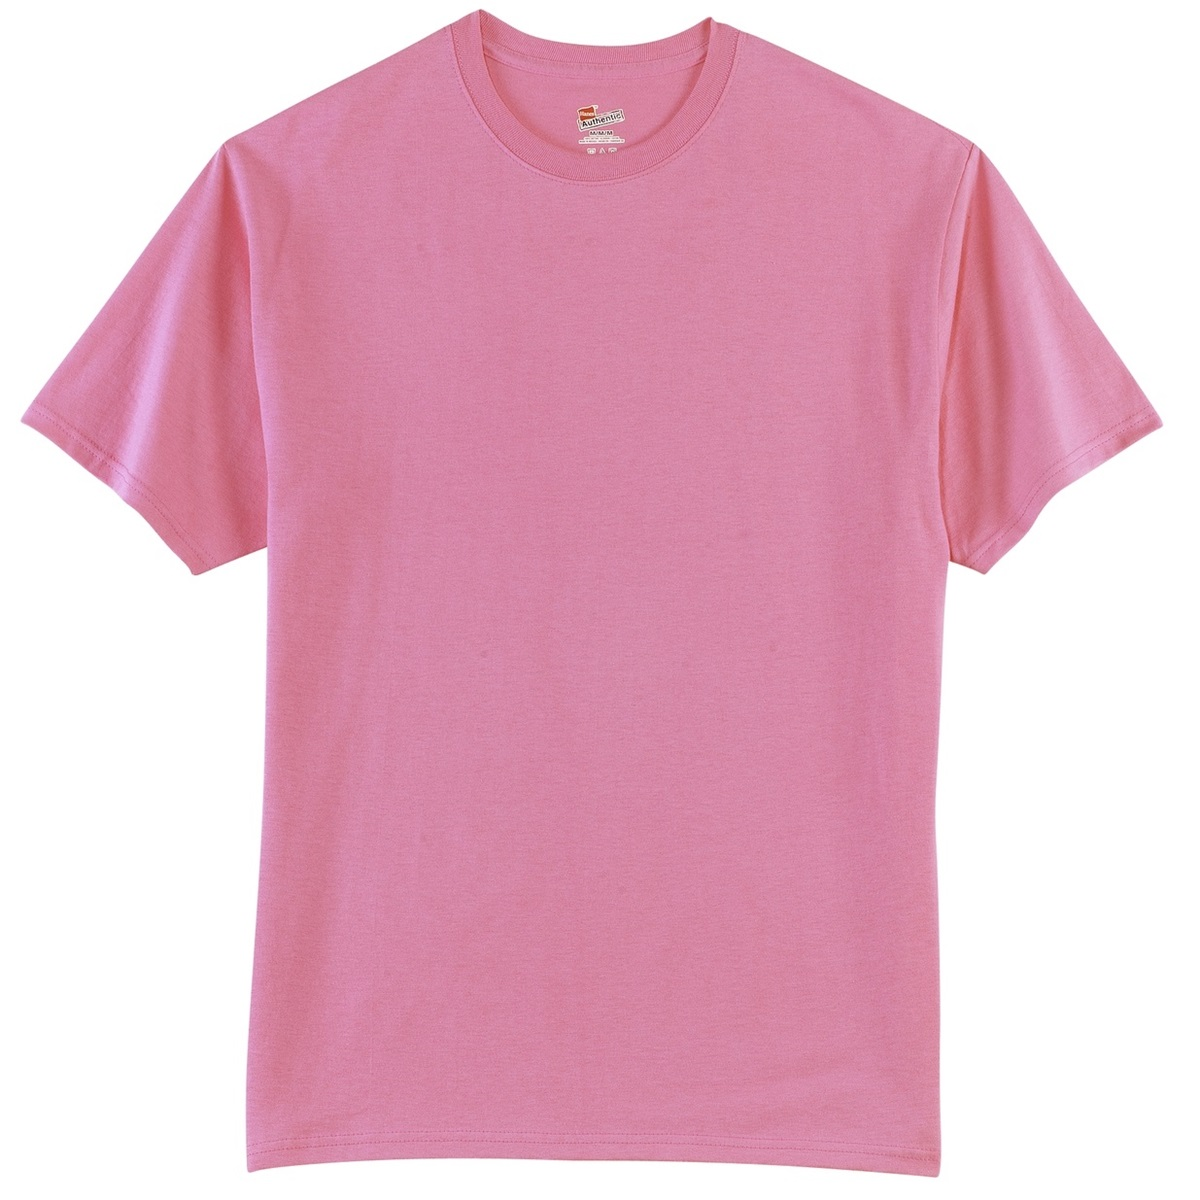 Hanes 5250 Tagless Cotton T Shirt Pink